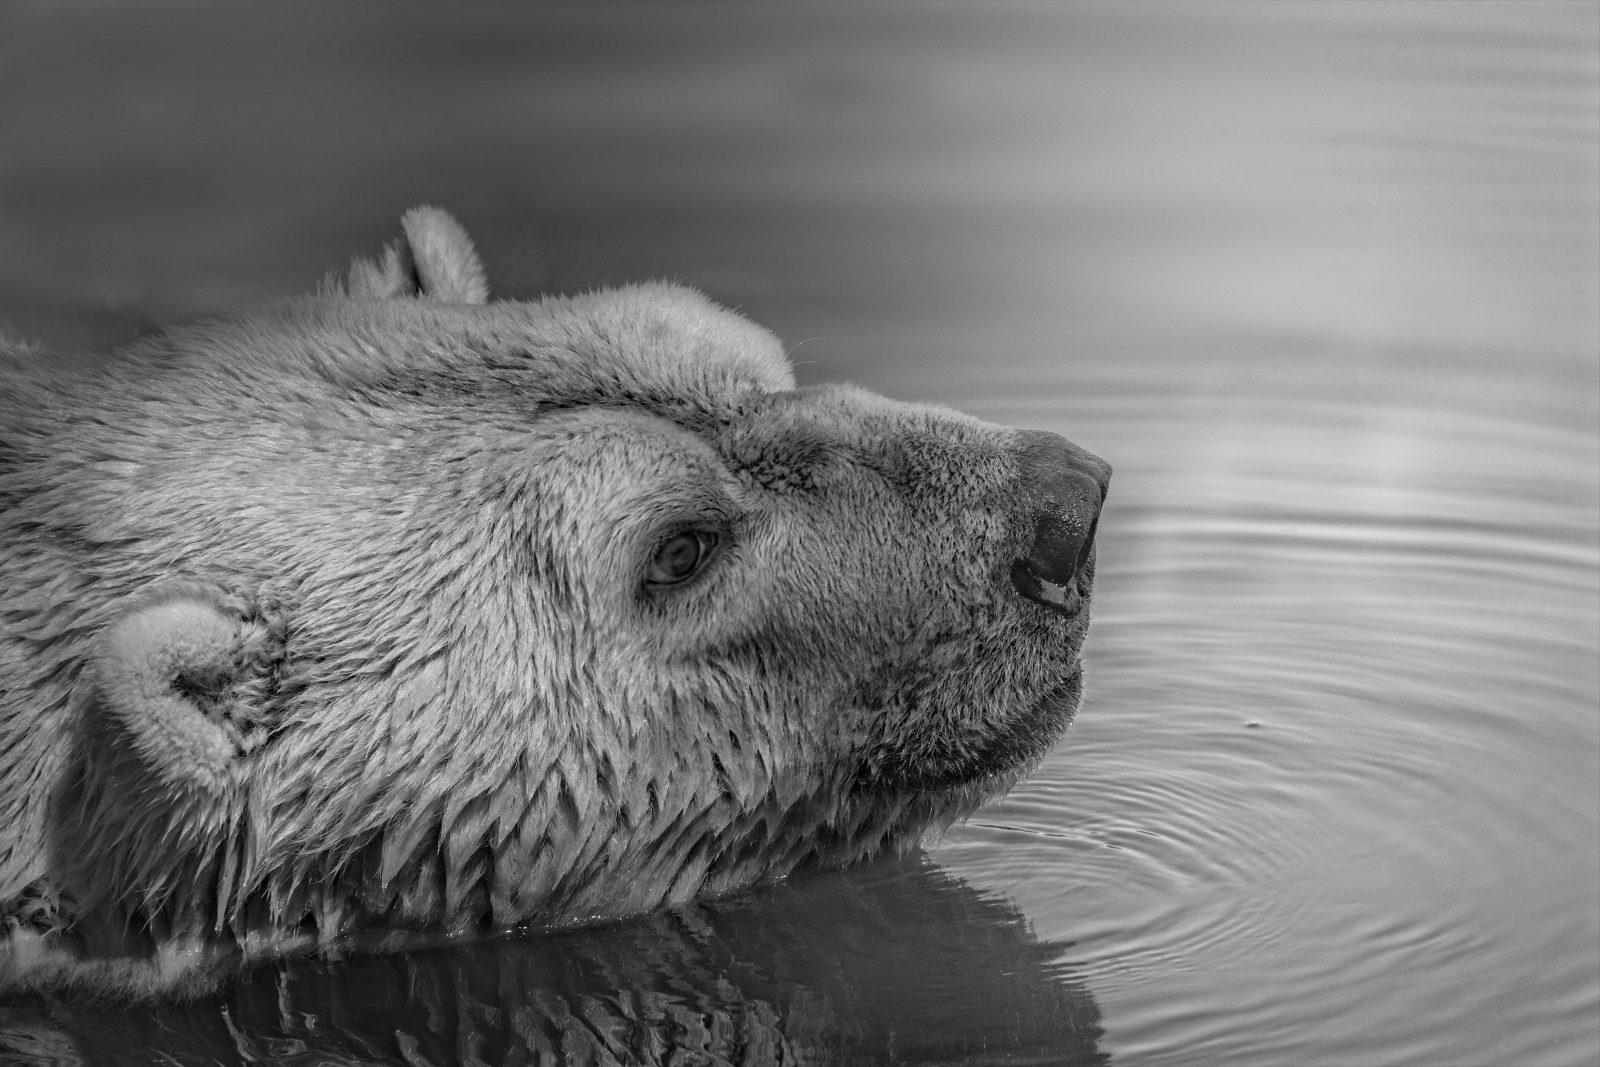 O urso polar precisa ser preservado.